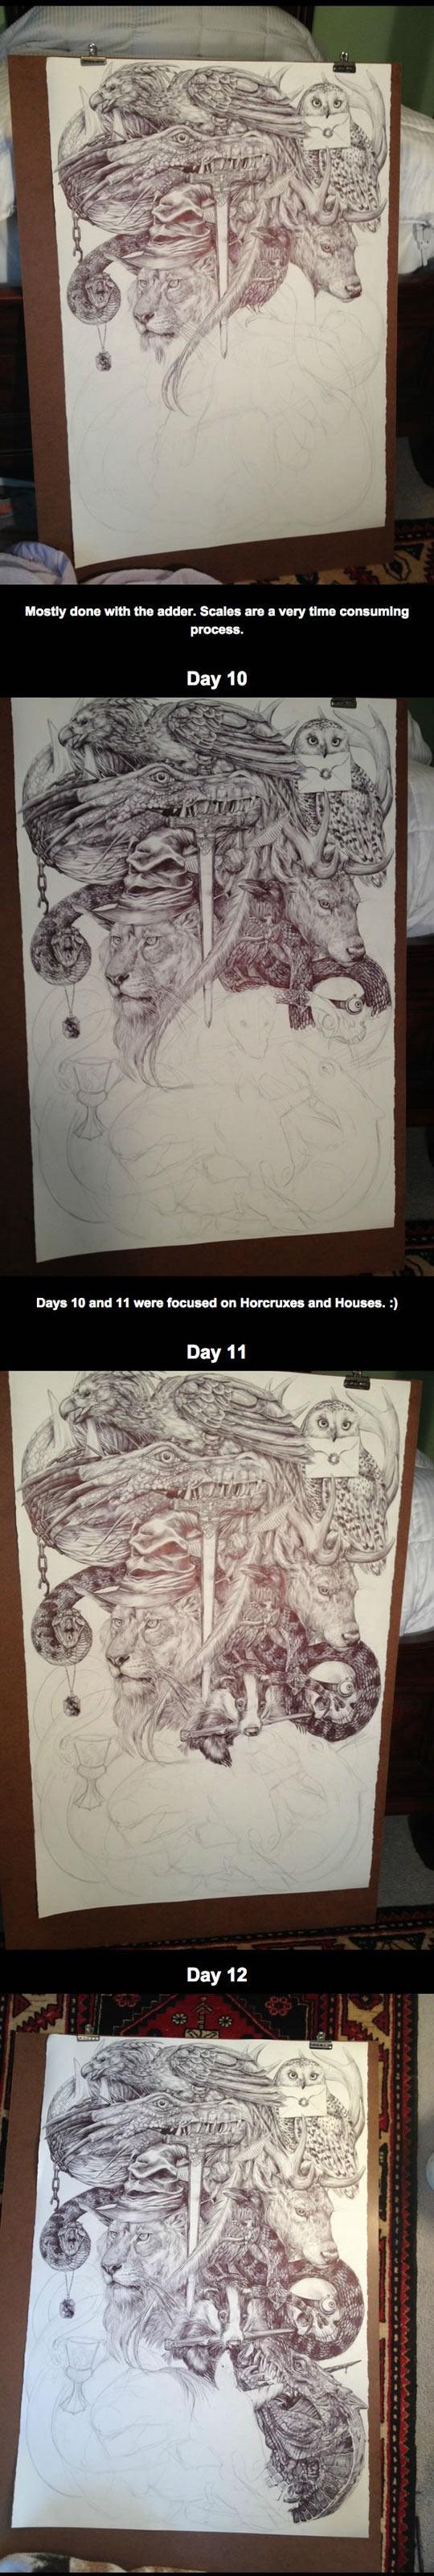 cool-Harry-Potter-drawing-lion-dragon-snake-sword